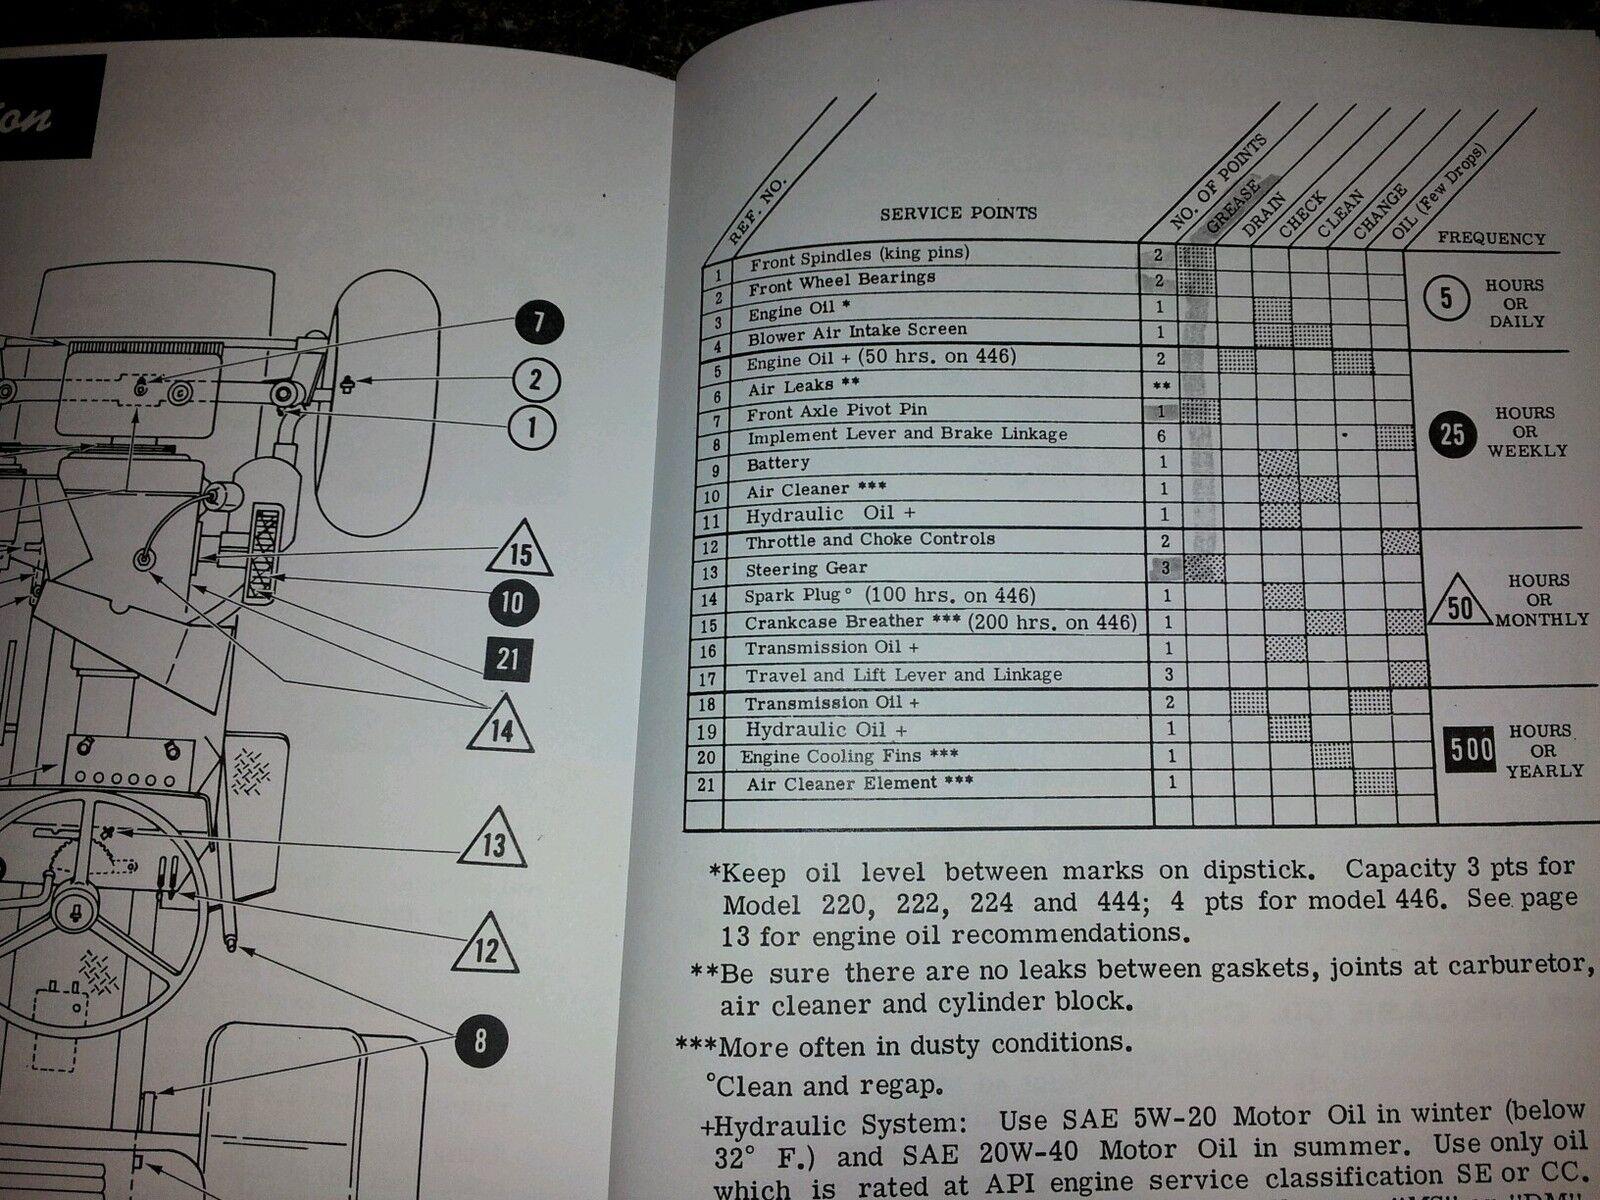 Case 220 222 224 444 446 Operators Manual Ebay Ingersoll Wiring Diagram